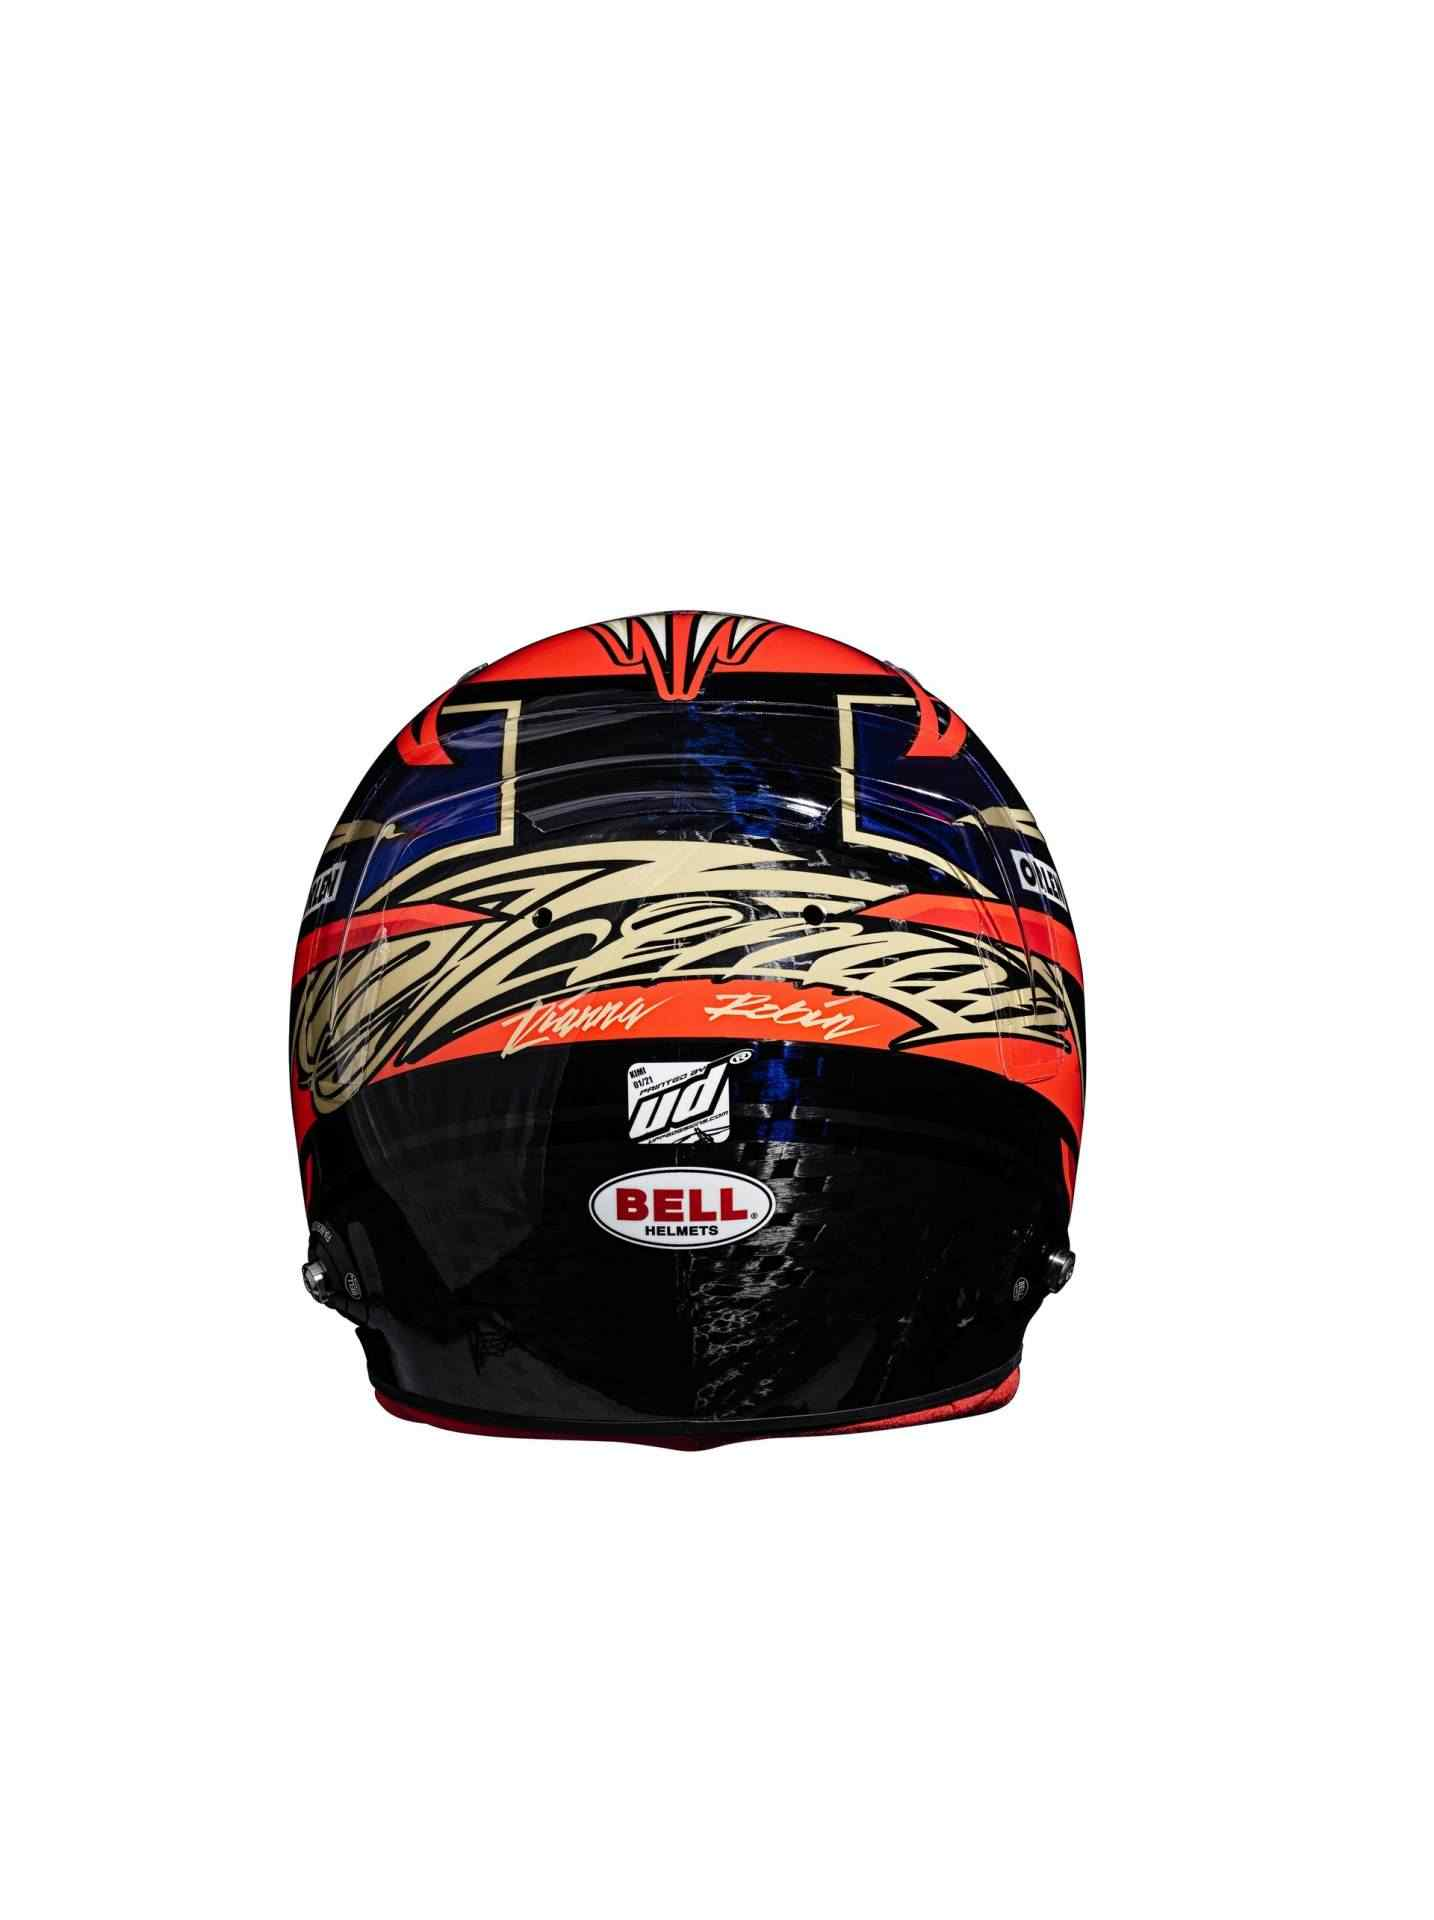 "Kimi-R""ikknen-Helmet-2"